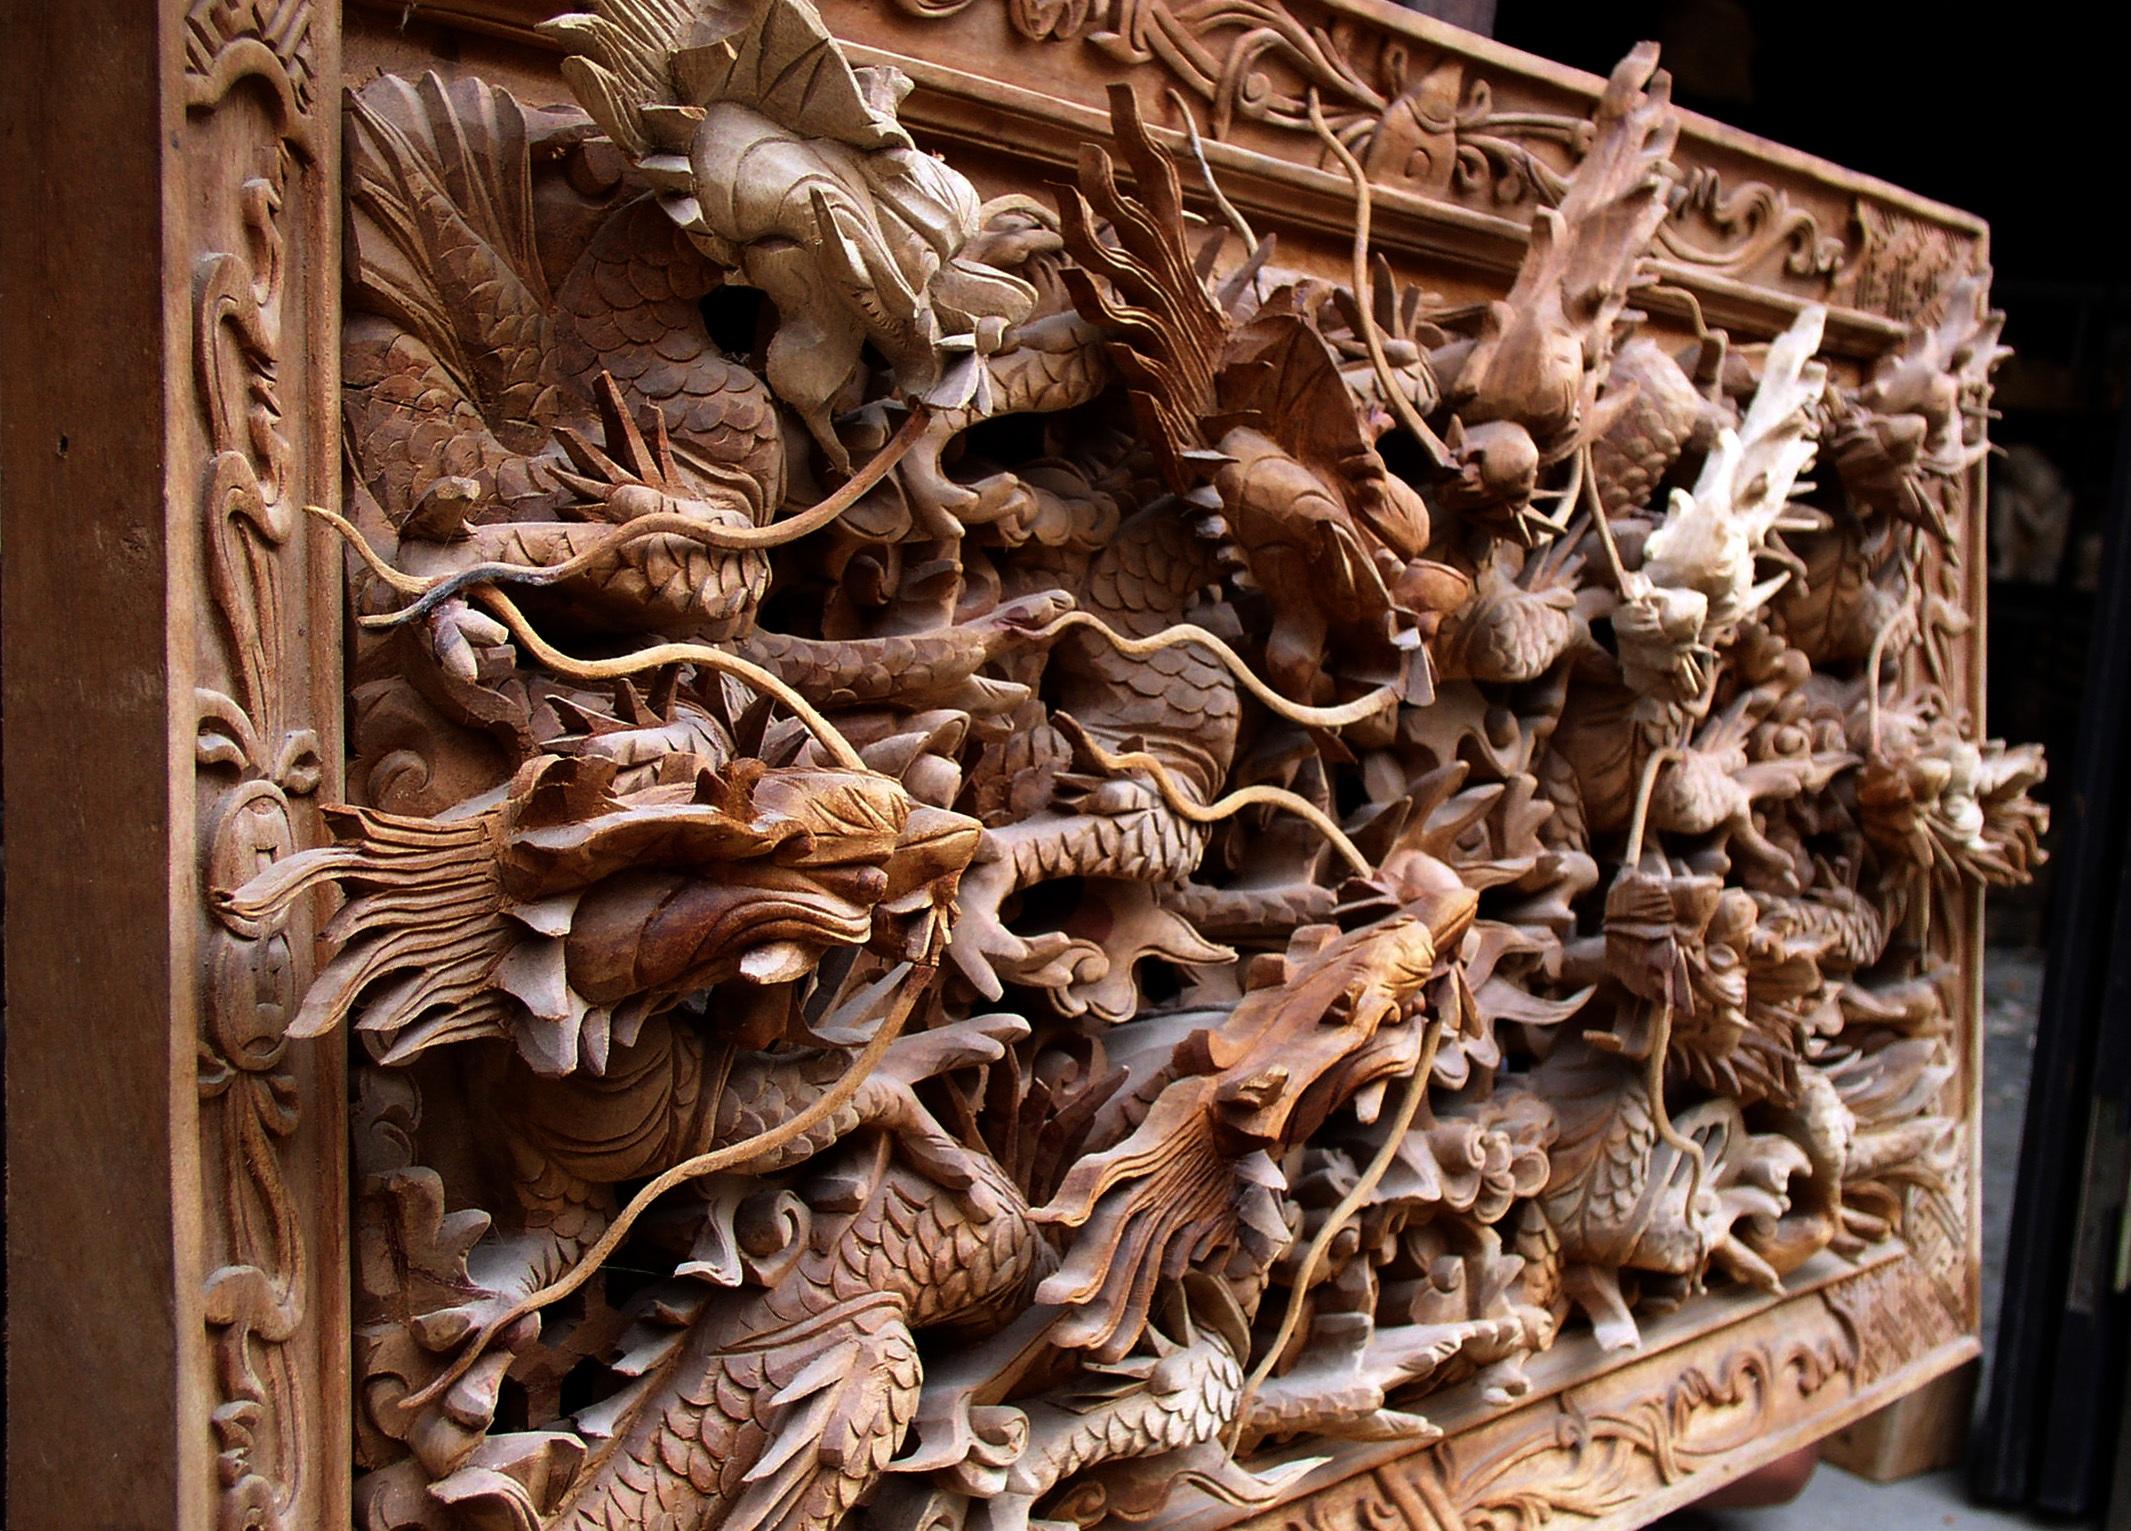 Fotos gratis antiguo textura interior decoración